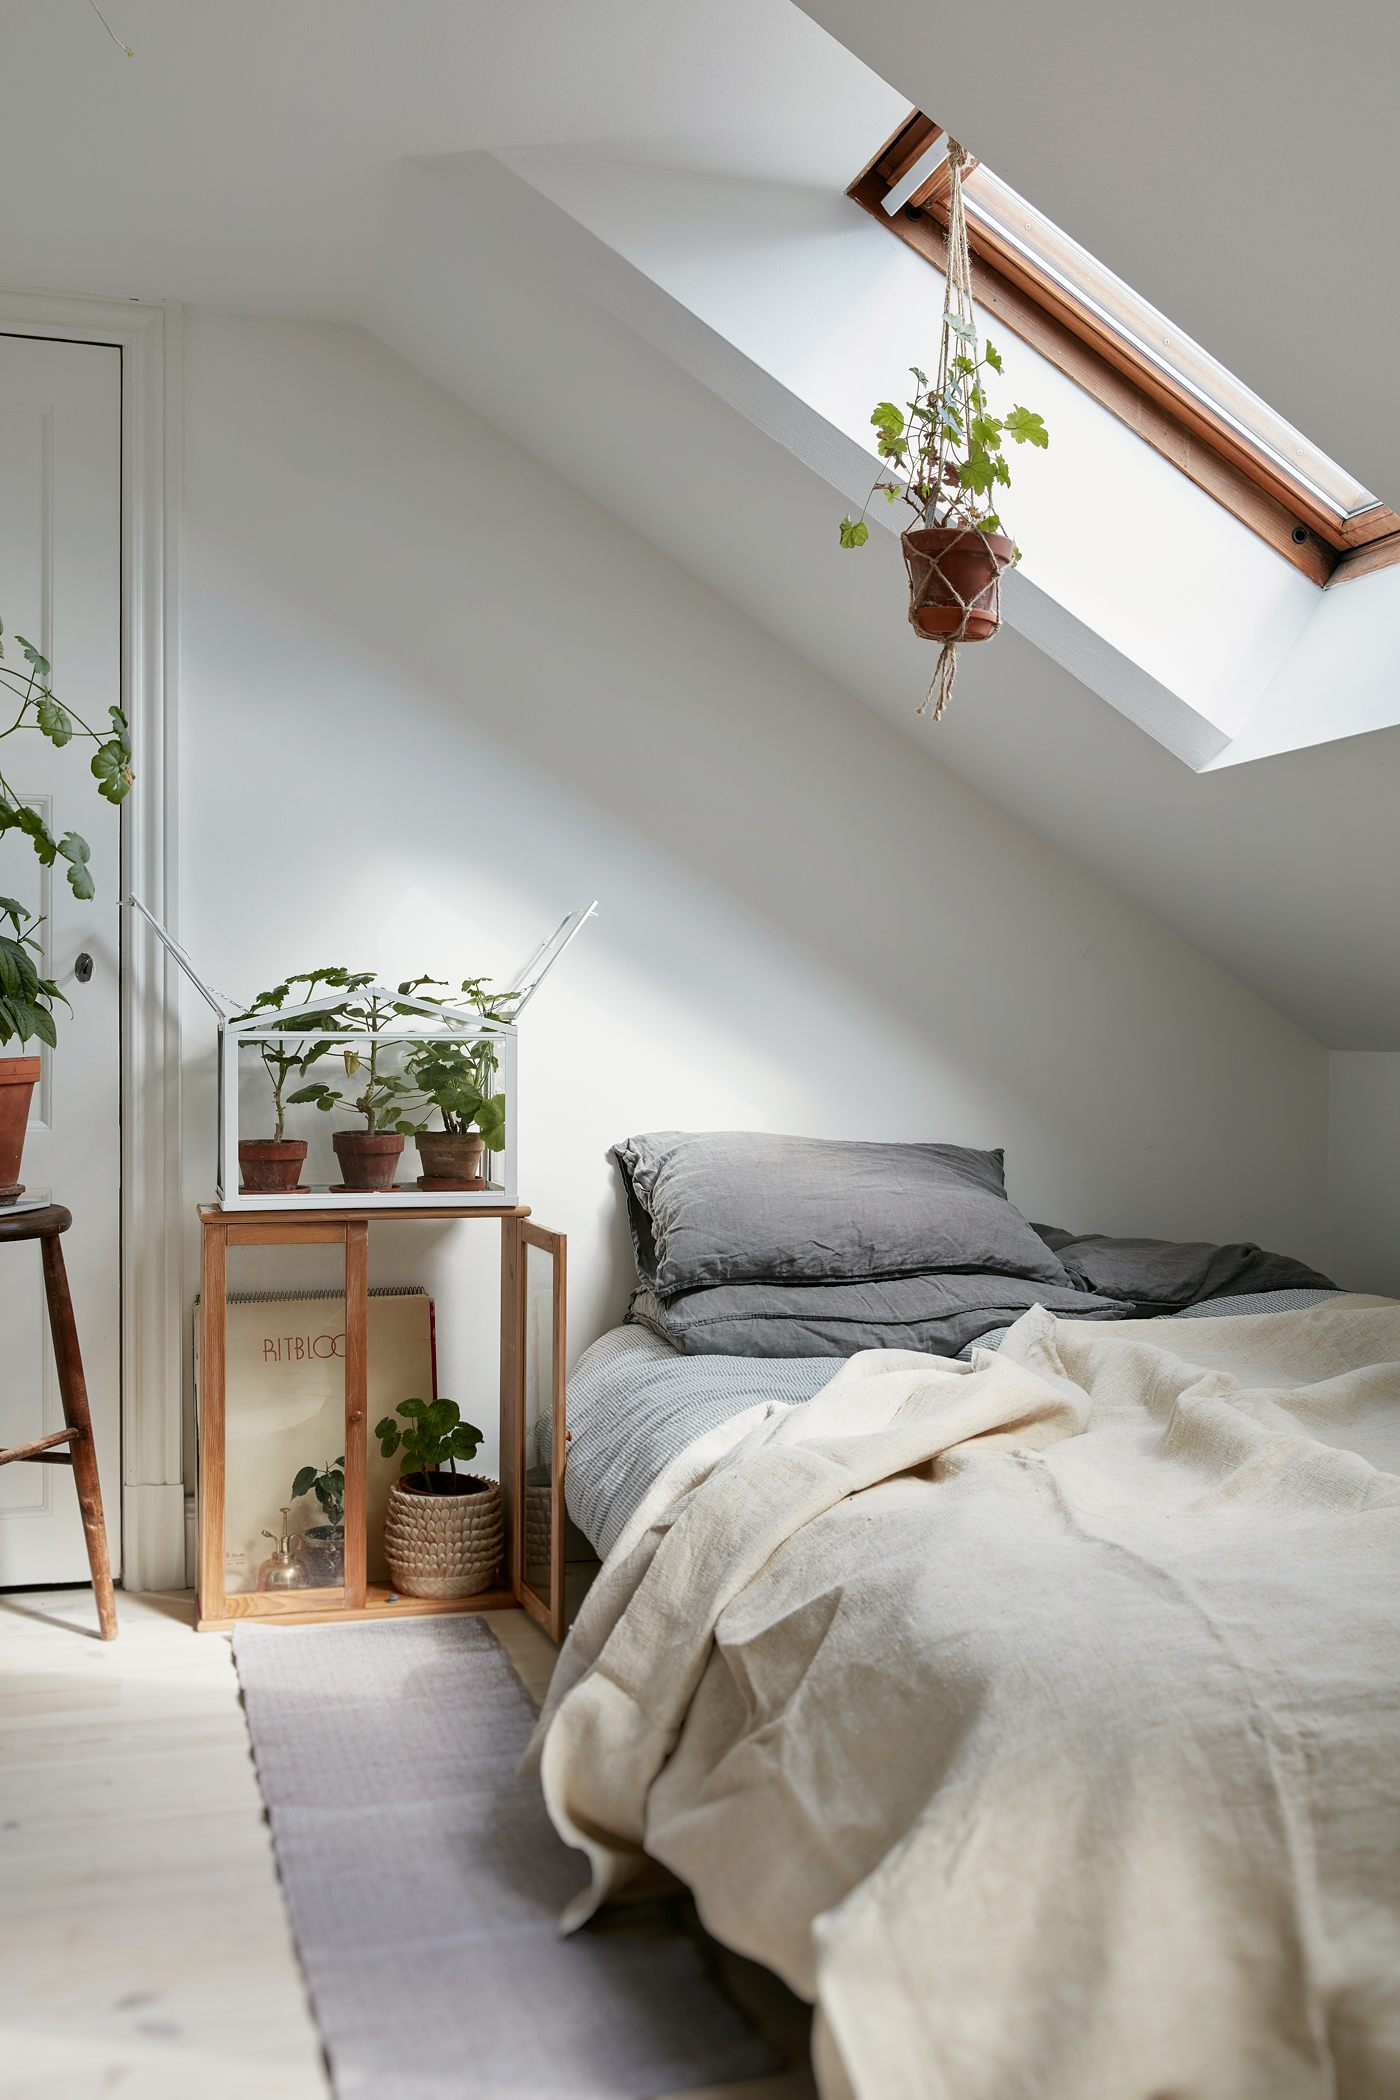 40 Minimalist Bedroom Ideas | Less is More | Homelovr on Bedroom Minimalist Design Ideas  id=11972